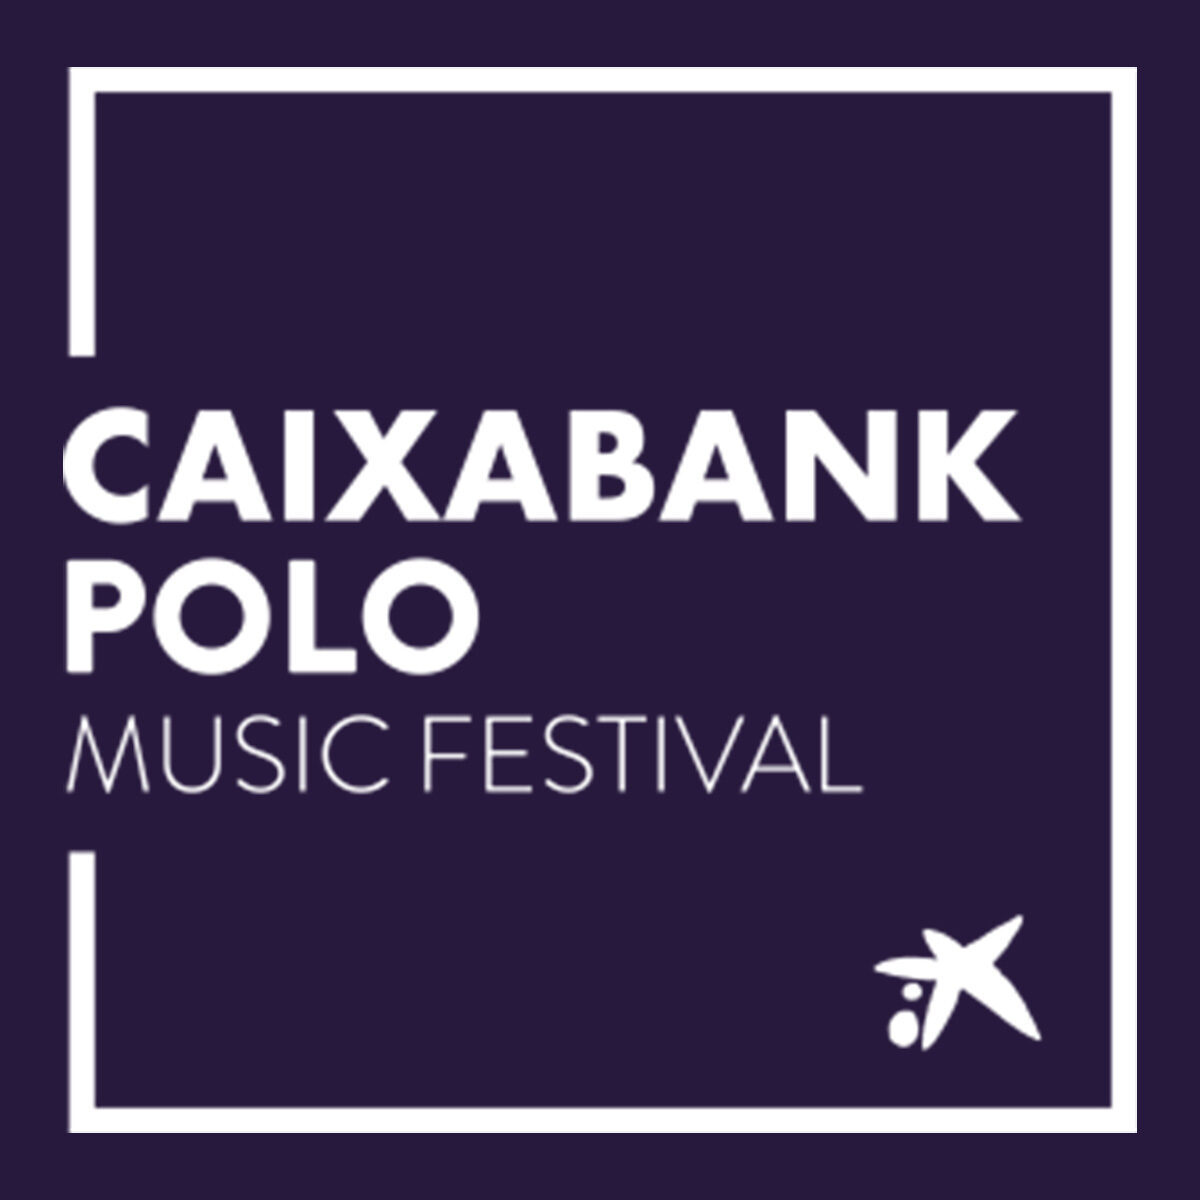 Caixabank Polo Music Festival 2020